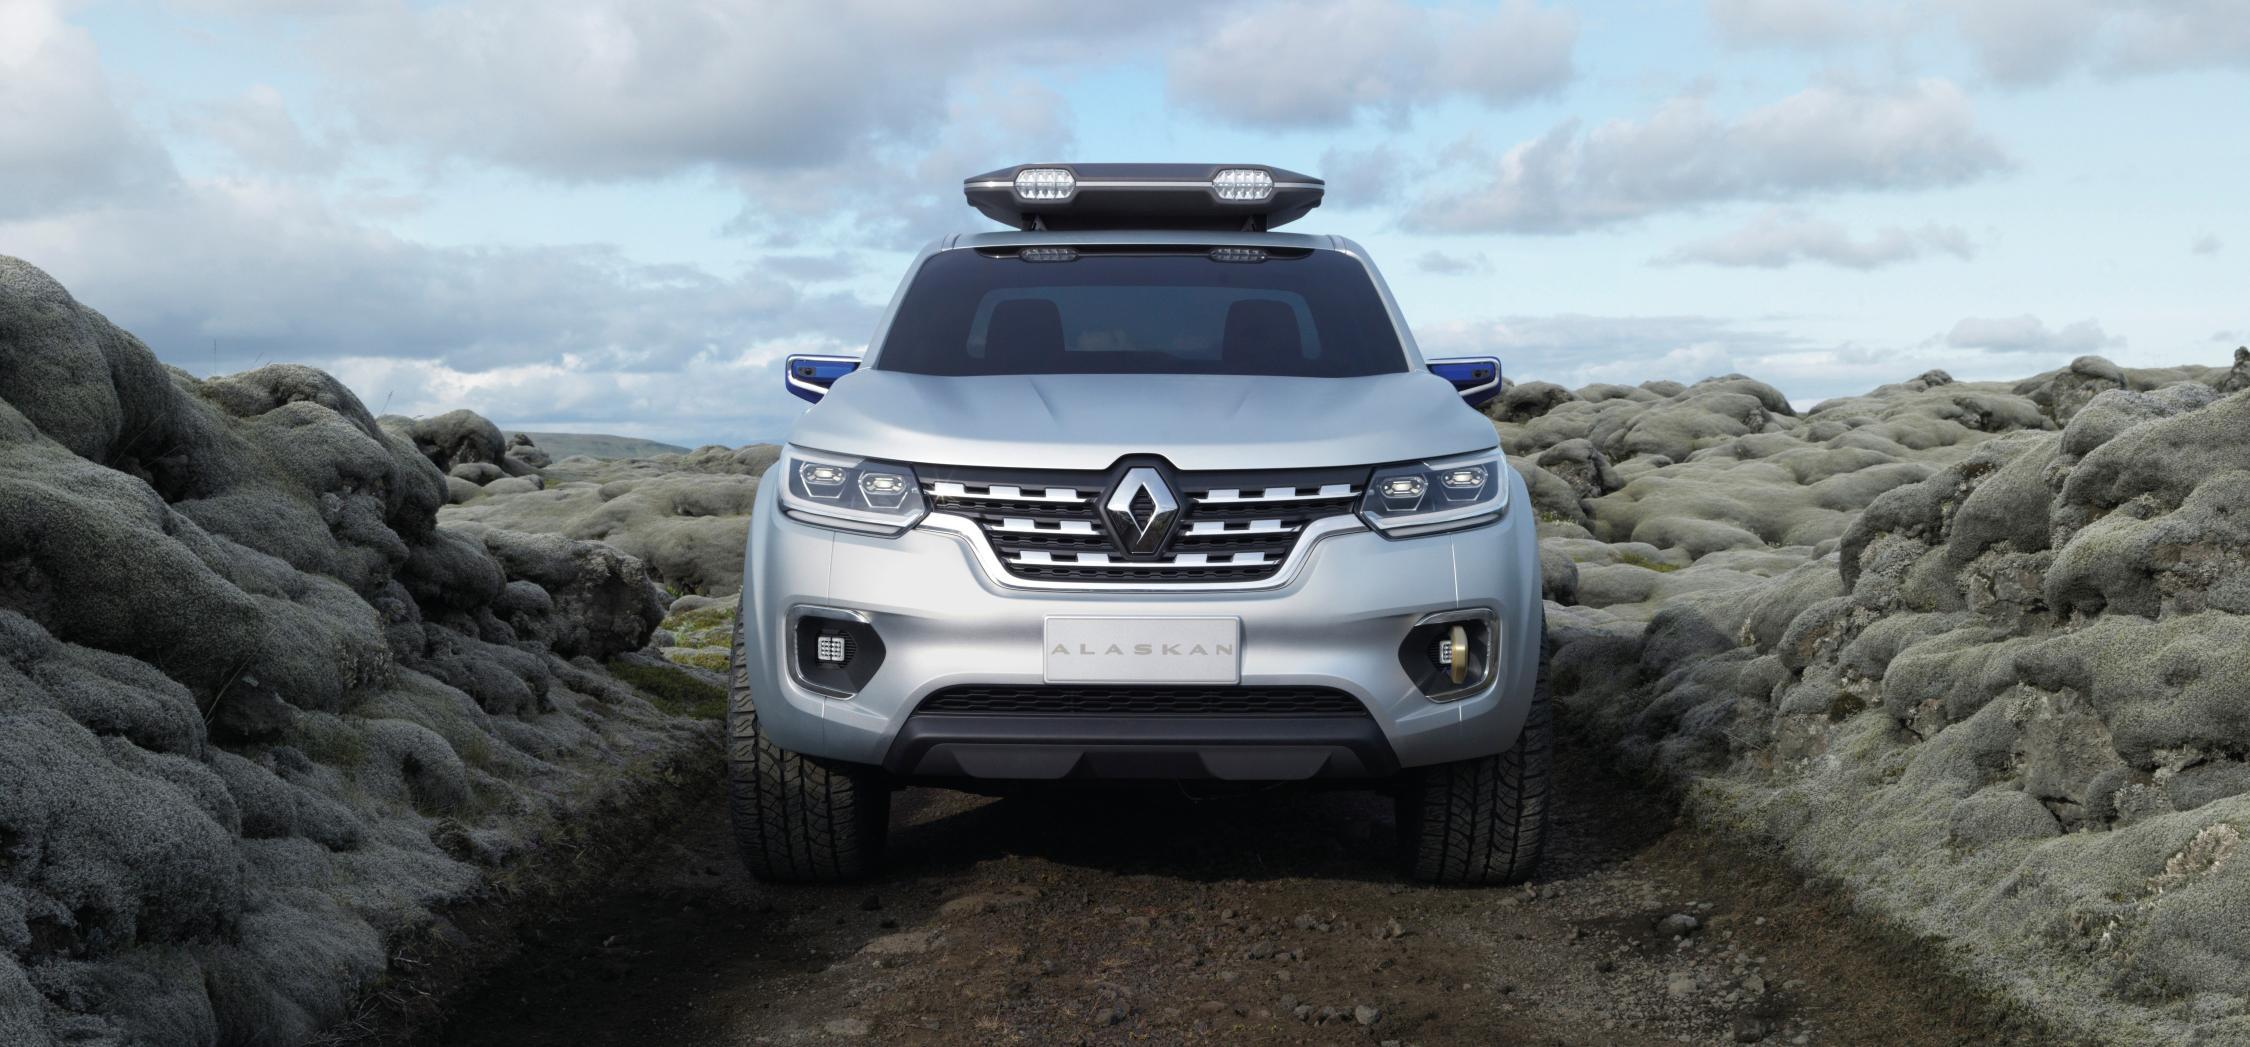 Renault Alaskan Concept 4